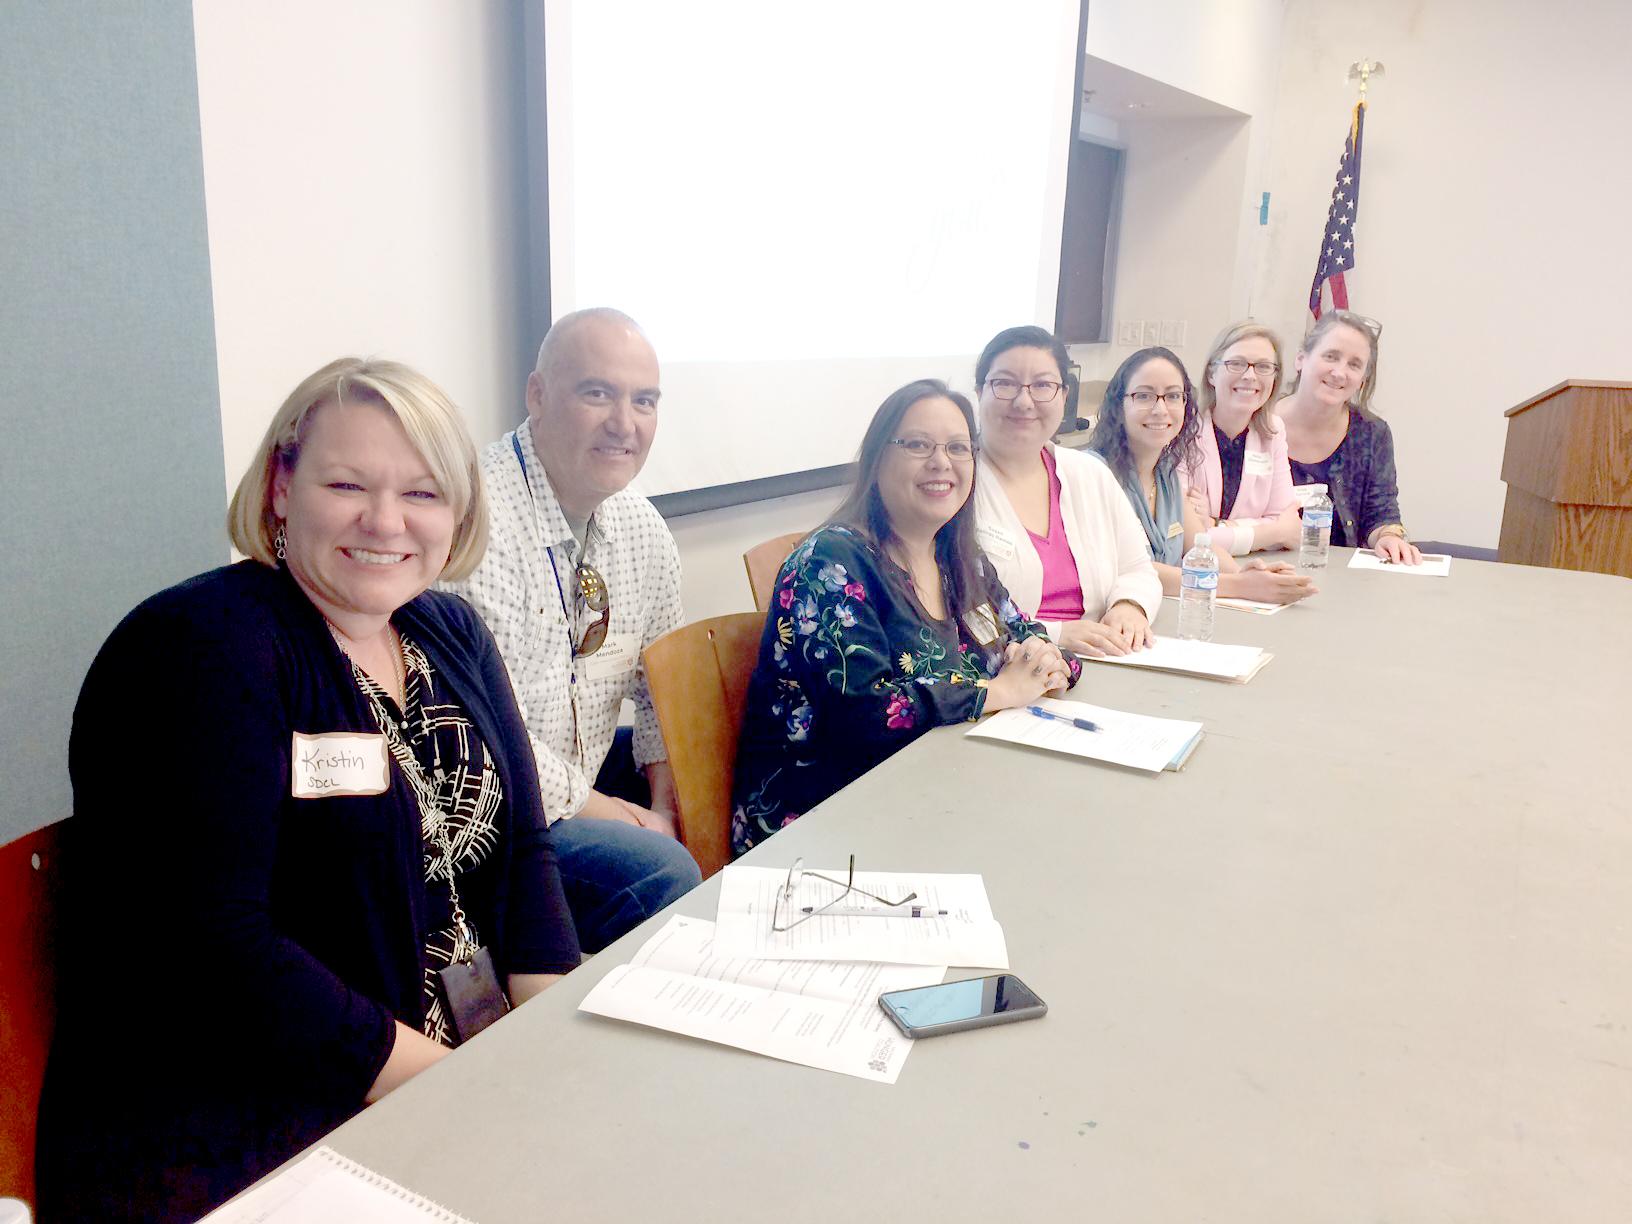 Central Panel (Front to Back) Kristin Ward, Mark Mendoza, Brenda Monzon, Susan Salinas Ramos, Vanessa Barnik, Patrice Chamberlain, Trish Garone